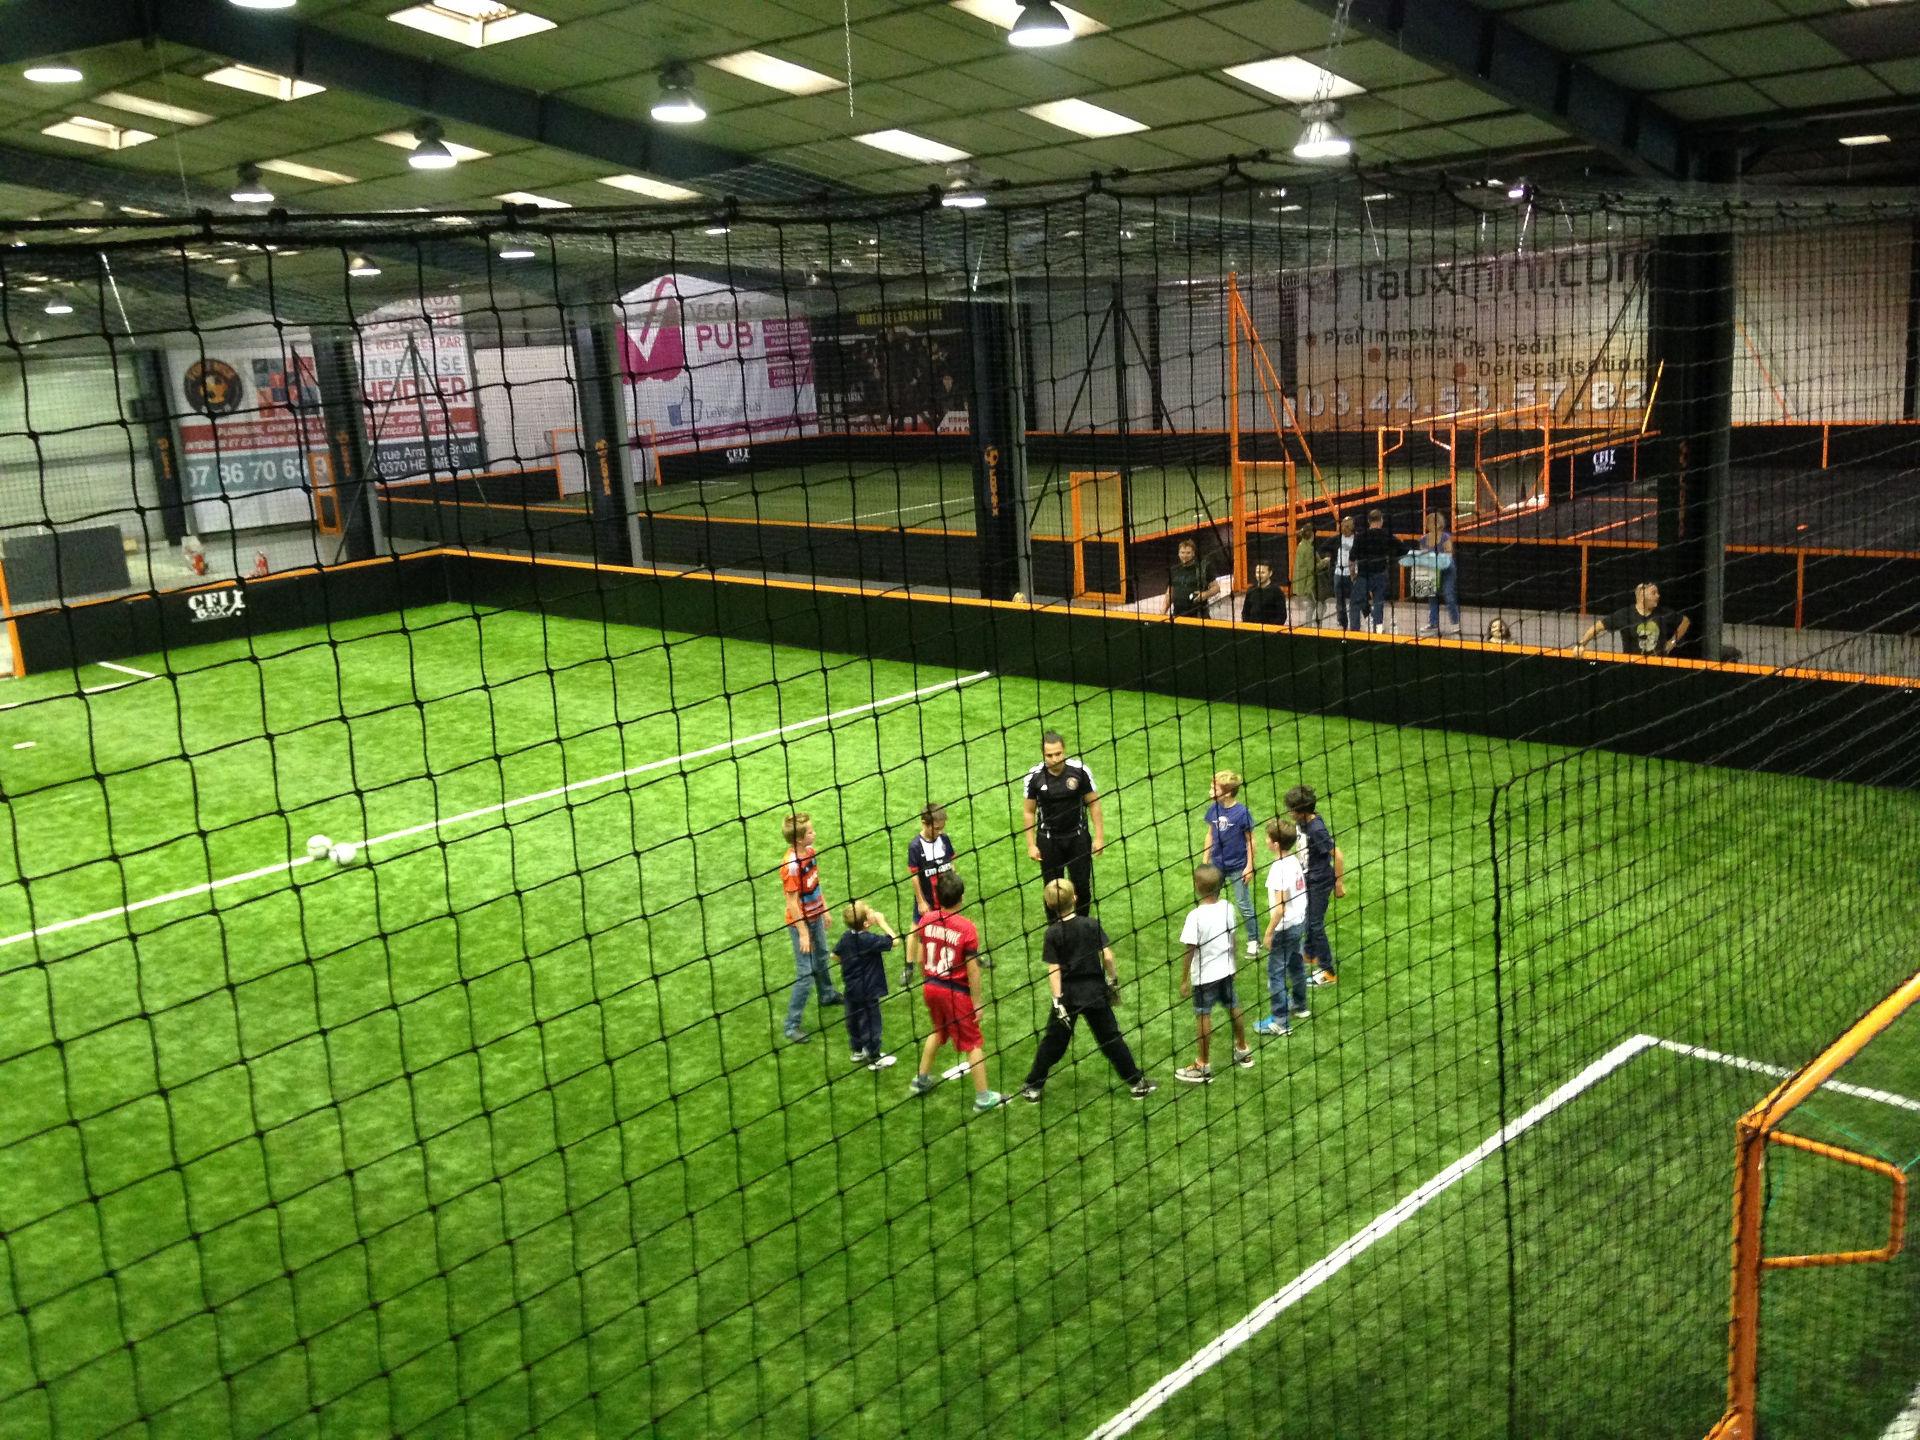 Pose de terrain de Futsal